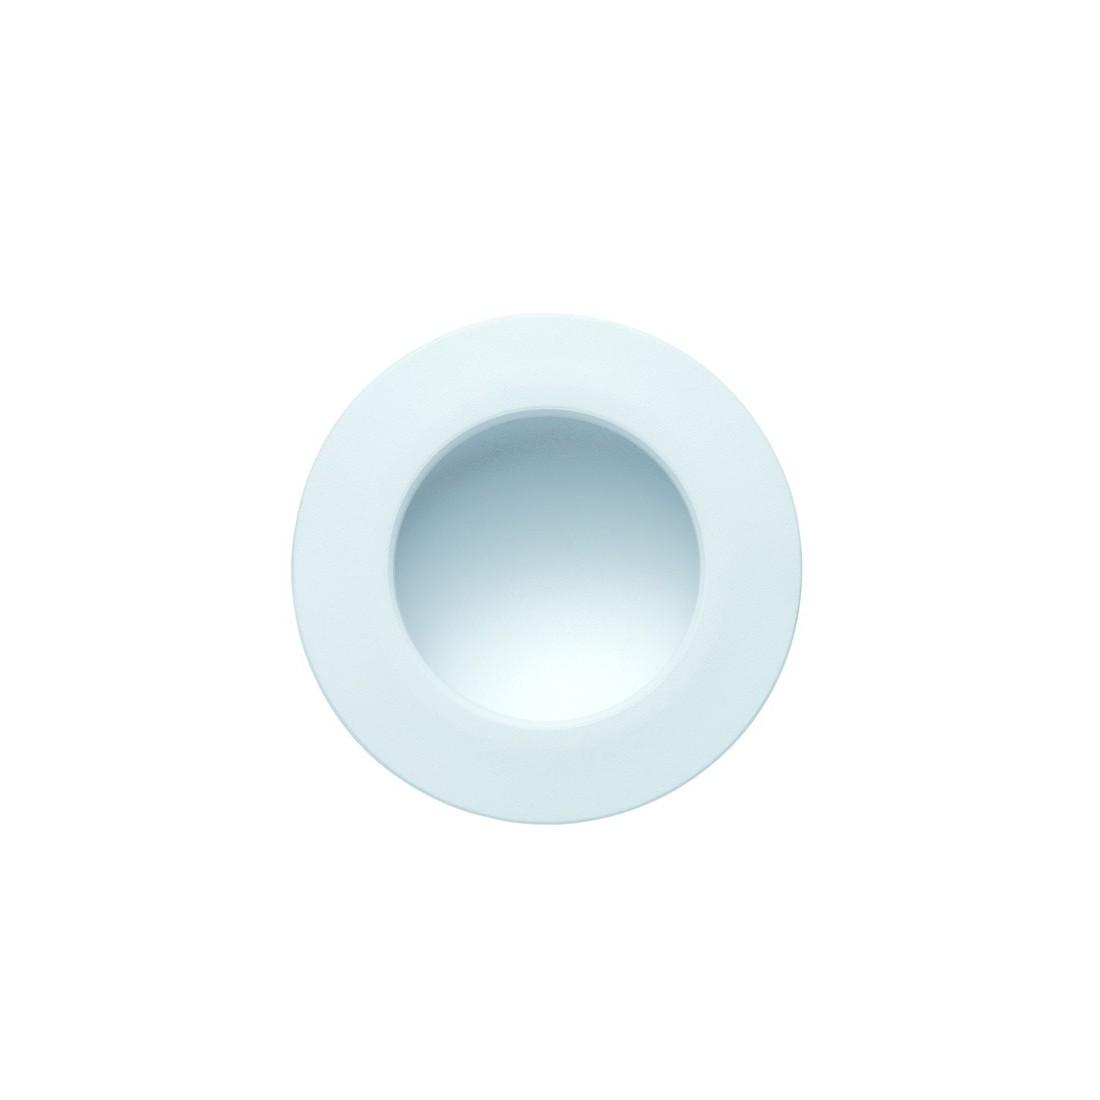 Lampara de bola philips lmpara bao drops forma bola - Lampara bola ikea ...